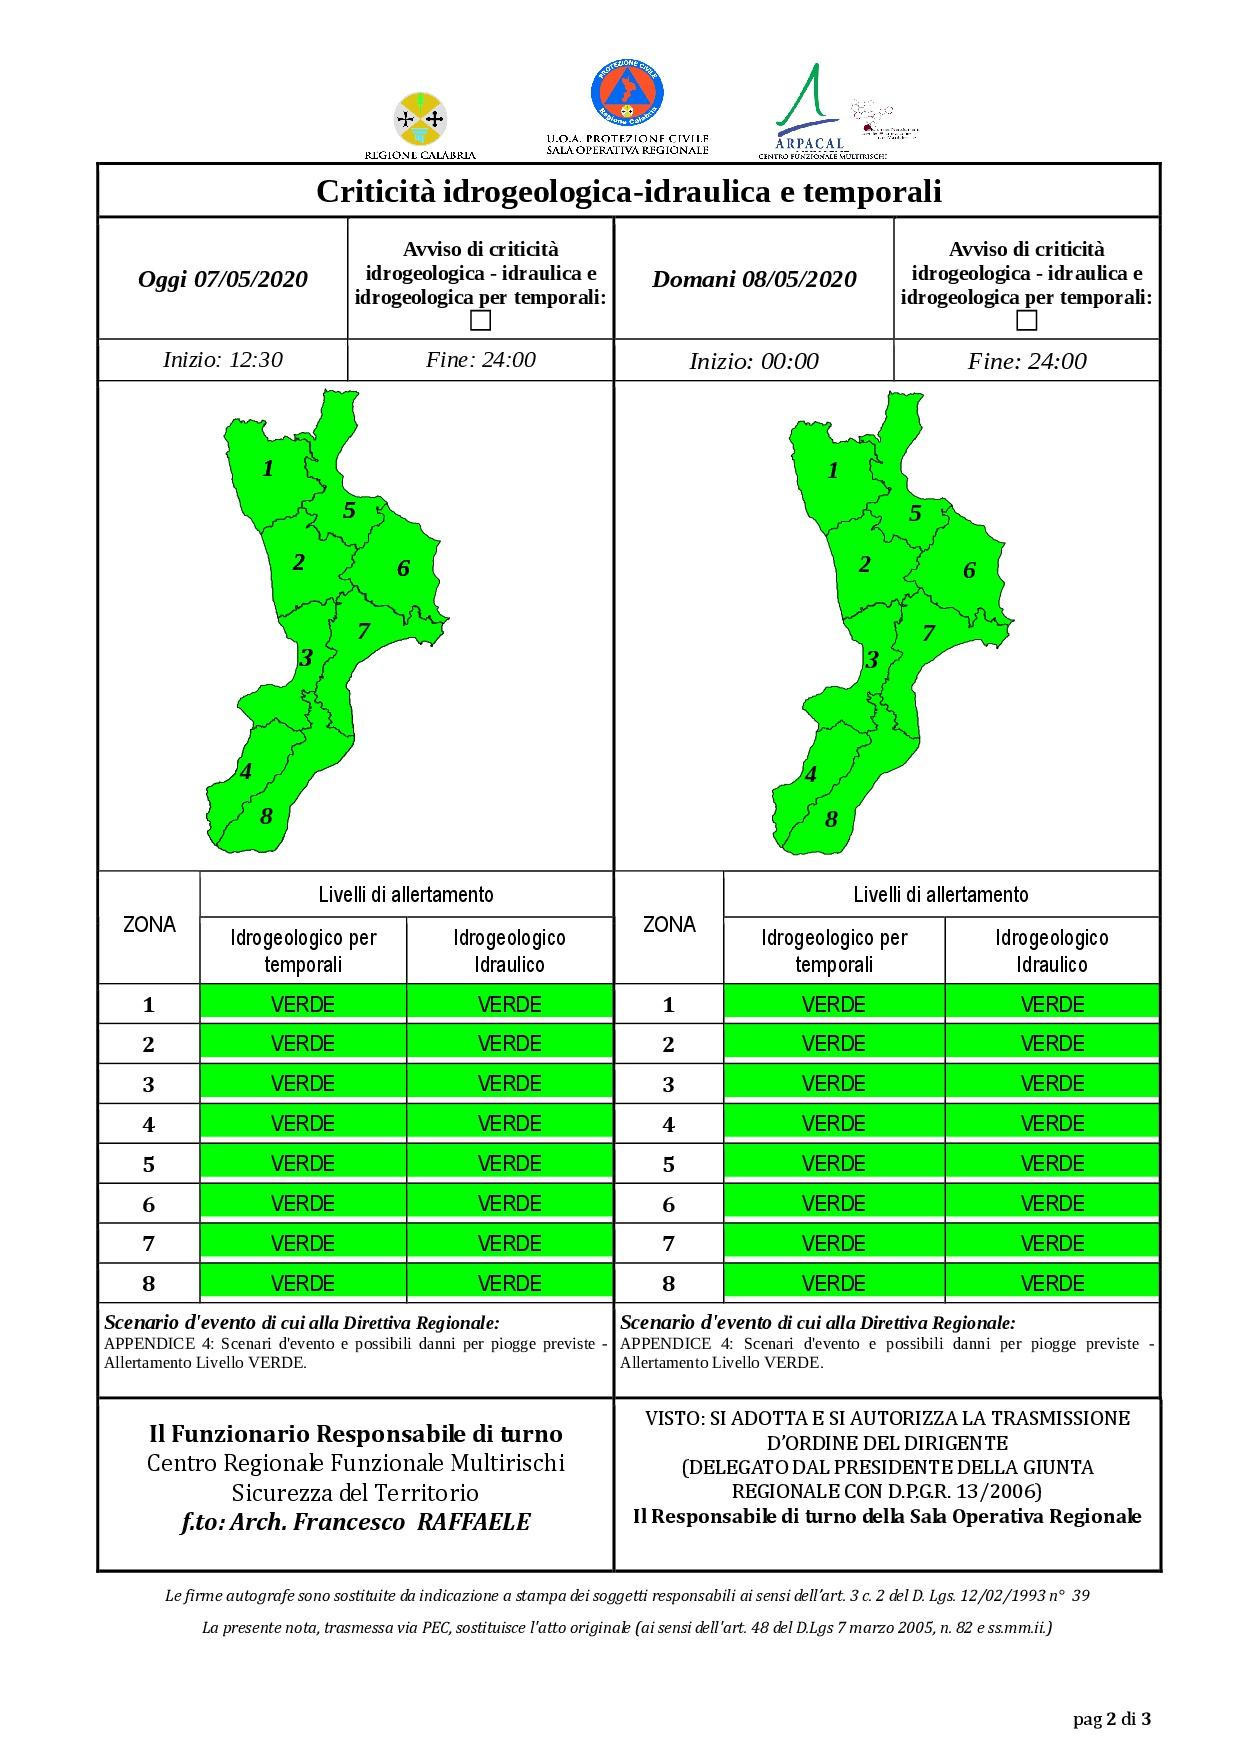 Criticità idrogeologica-idraulica e temporali in Calabria 07-05-2020